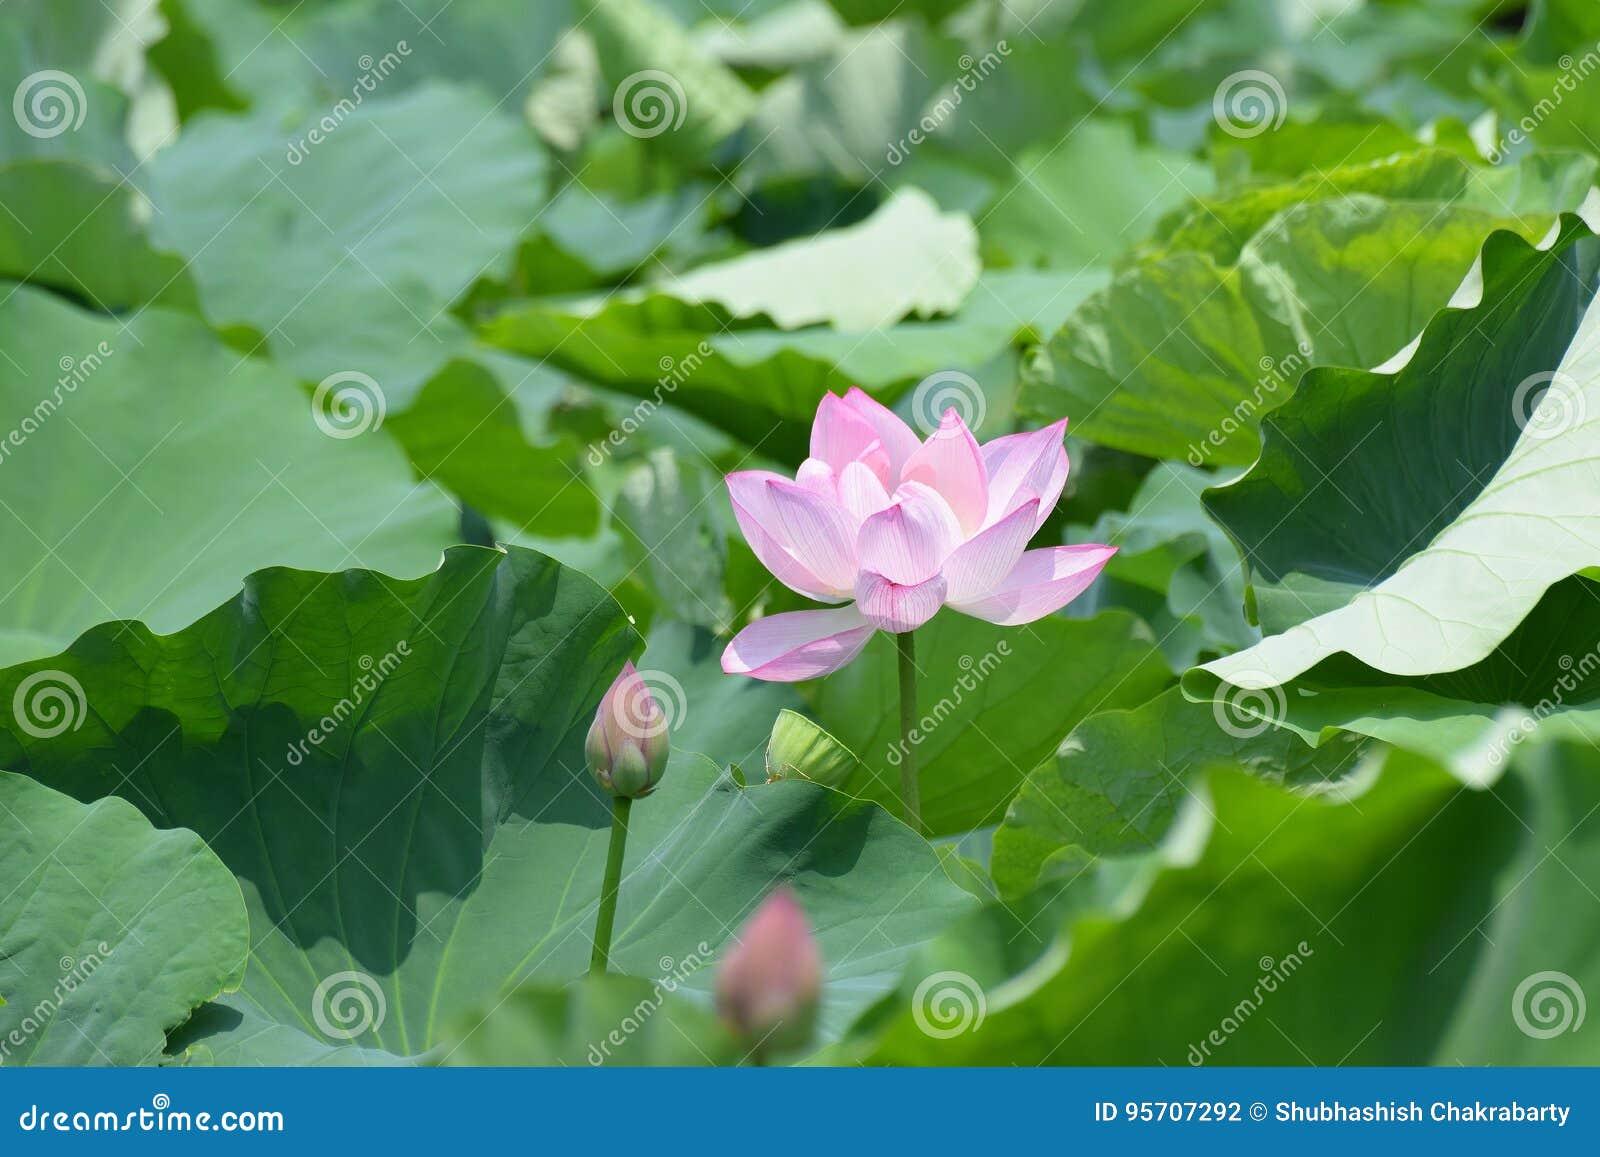 Macro details of japanese pink lotus flower horizontal frame stock download macro details of japanese pink lotus flower horizontal frame stock photo image of hachimangu mightylinksfo